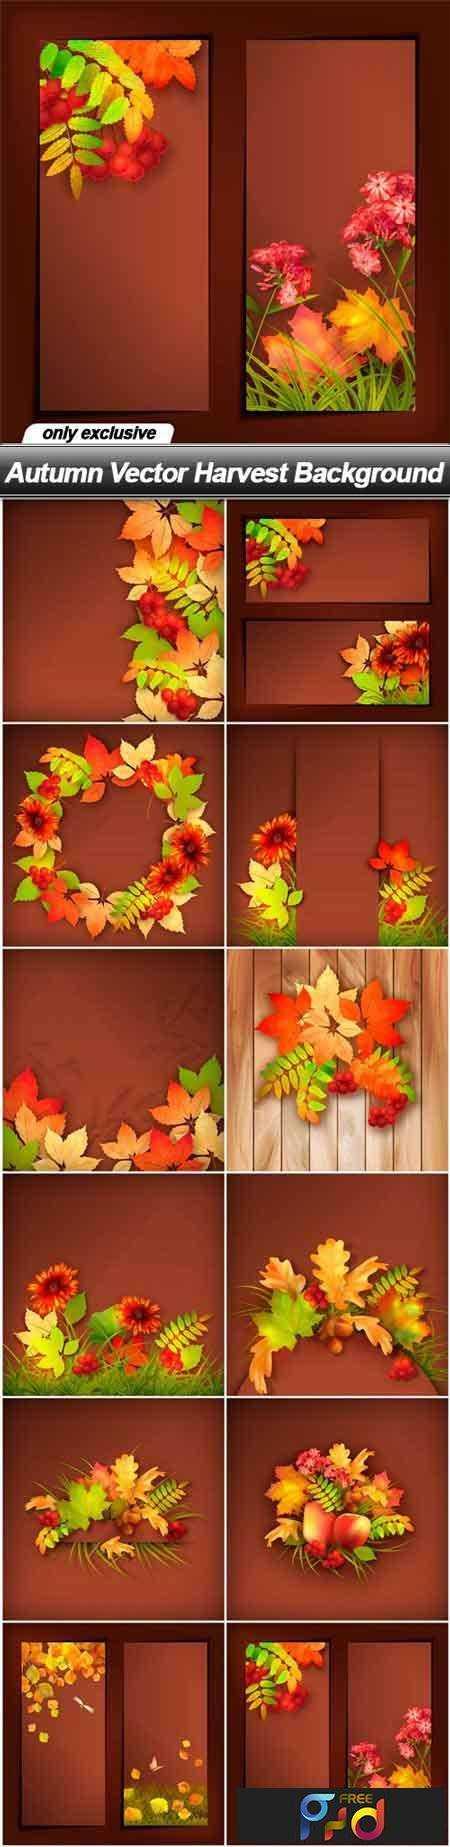 freepsdvn-com_vector_1701015_autumn_vector_harvest_background_12_eps